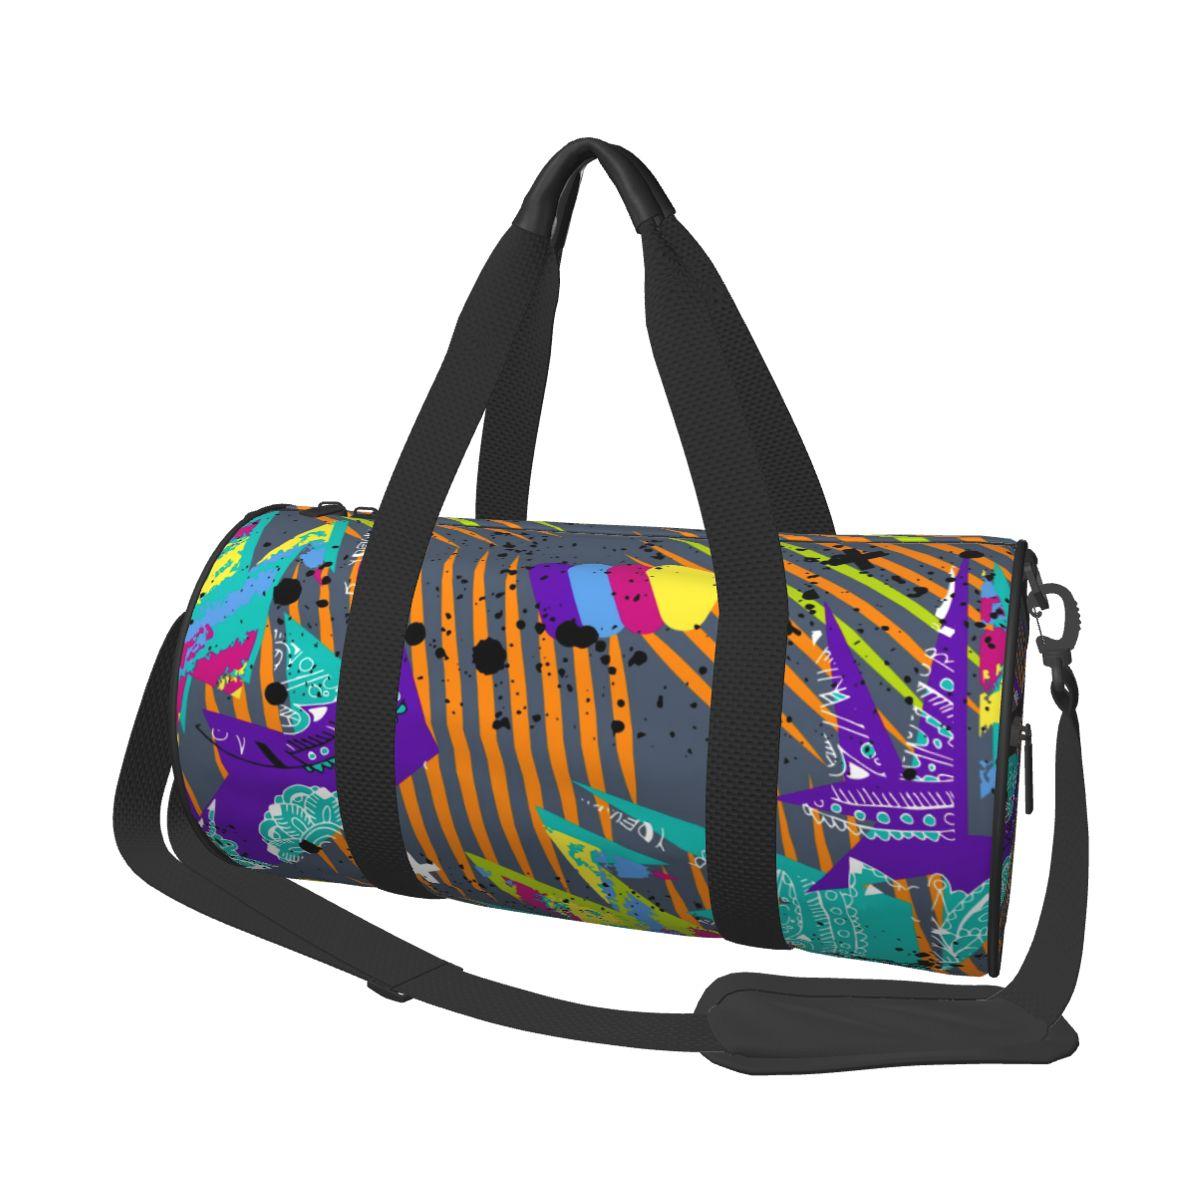 Travel Bag Large Capacity Luggage Duffle Bag Dots Geometric Figures Stripes Leisure Handbag Shoulder